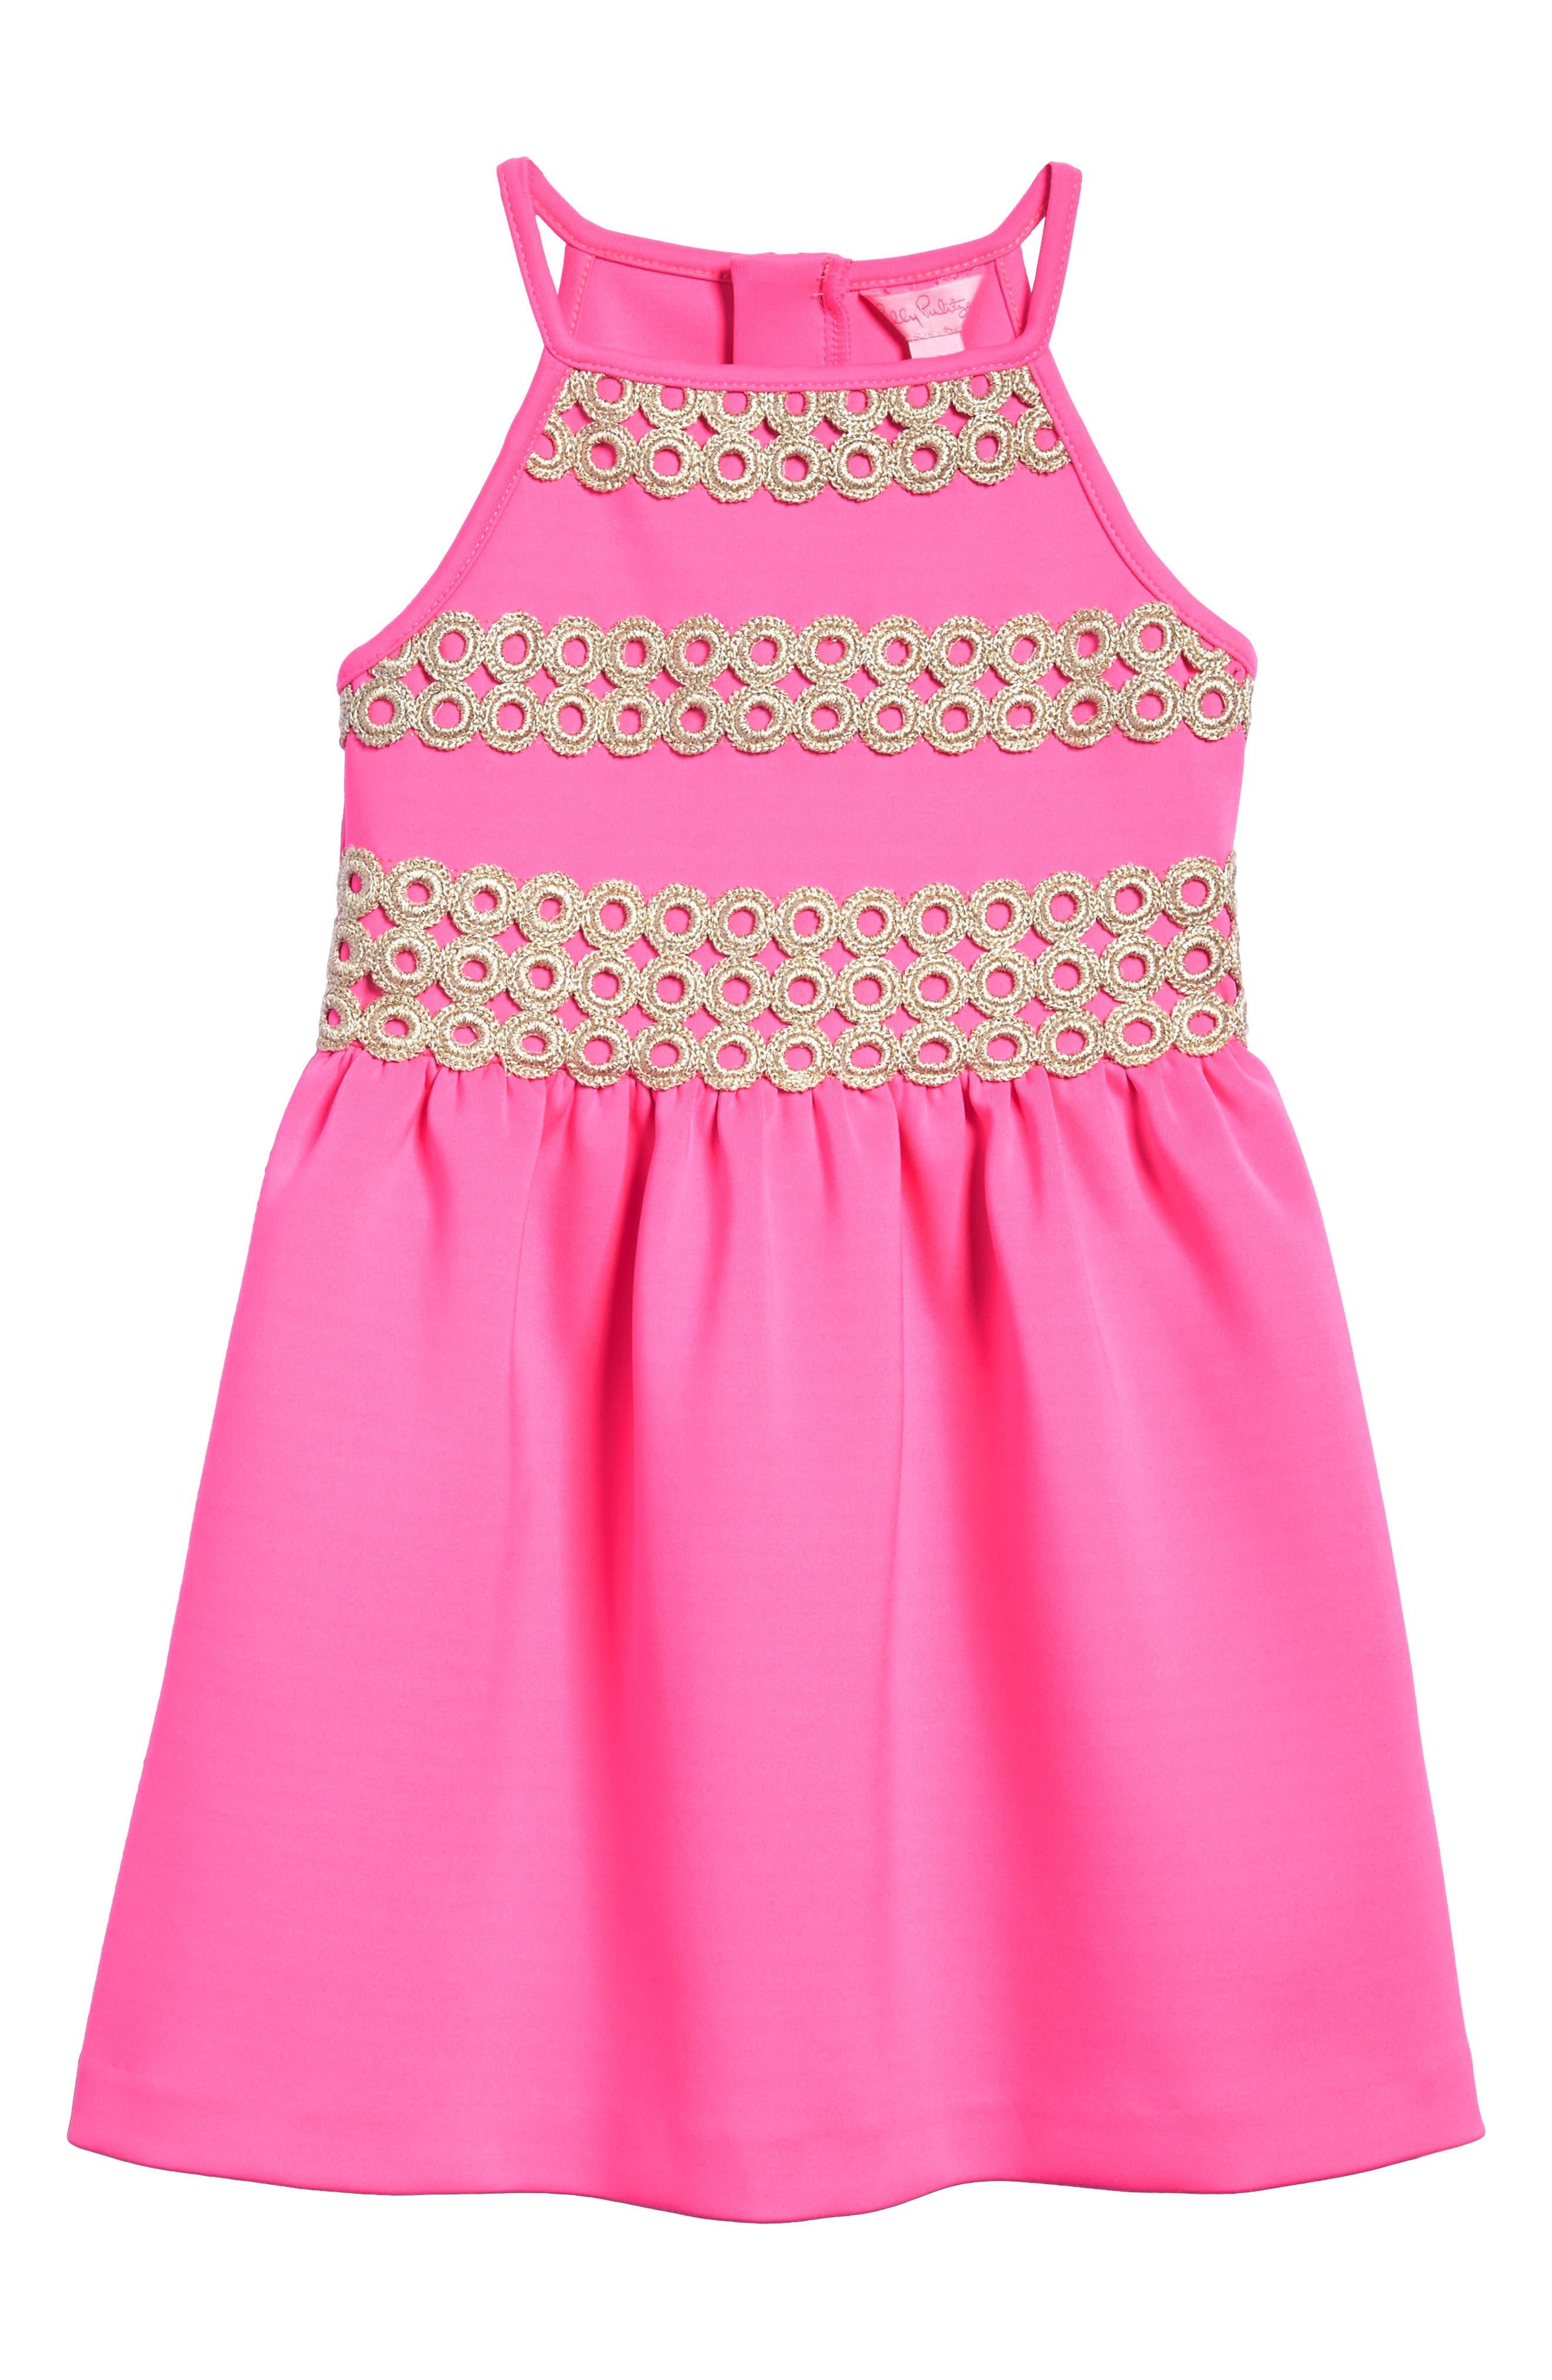 Elize Fit & Flare Dress,                         Main,                         color, 655